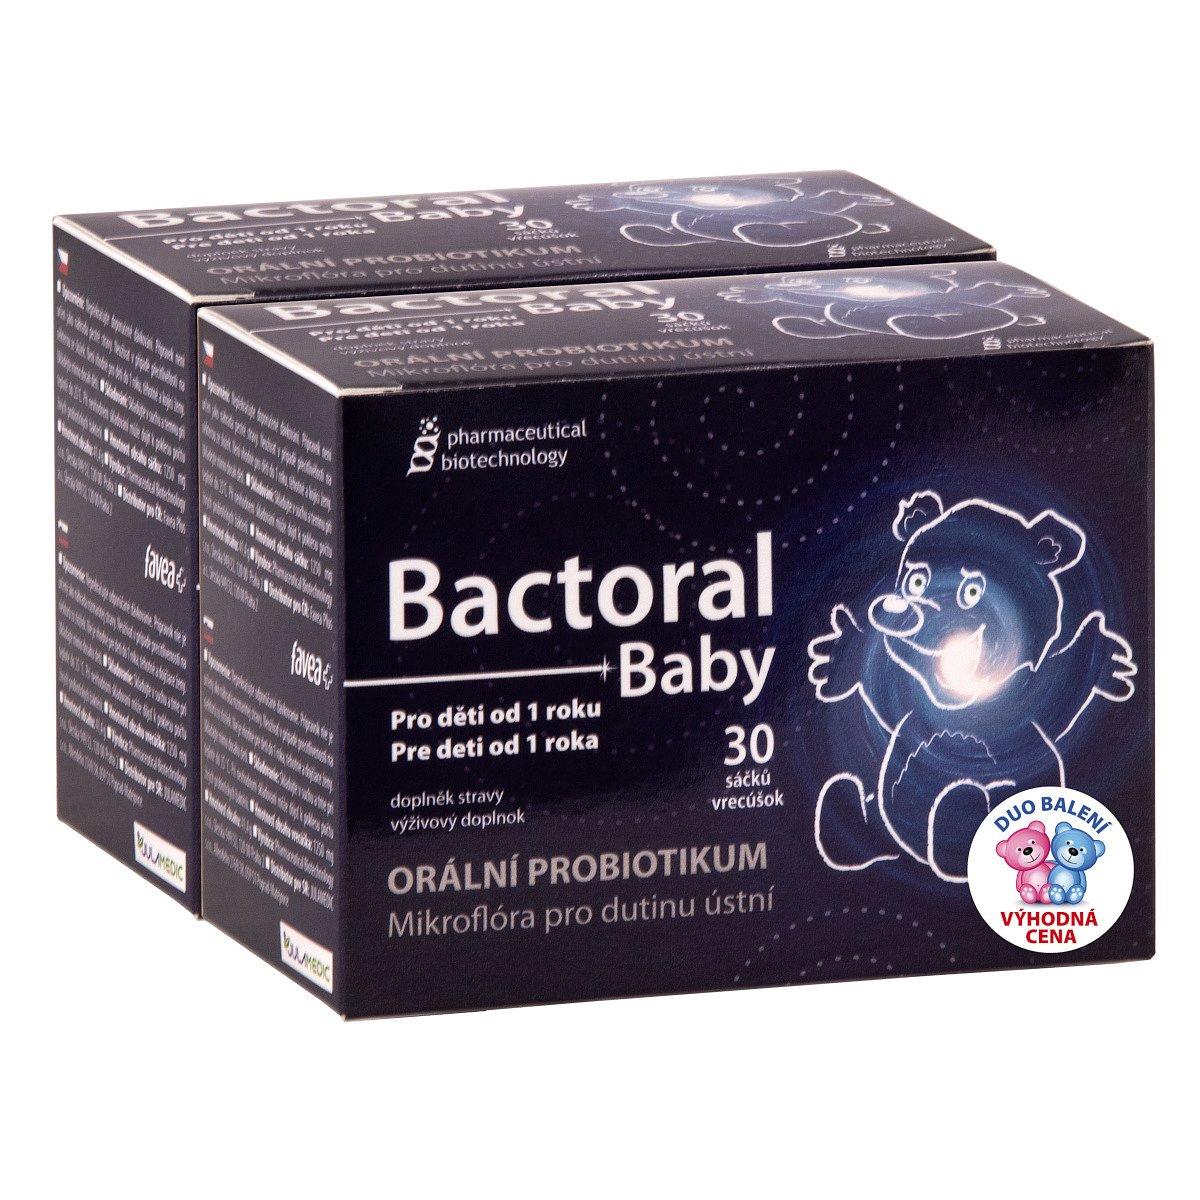 Bactoral baby 2x30 sáčků